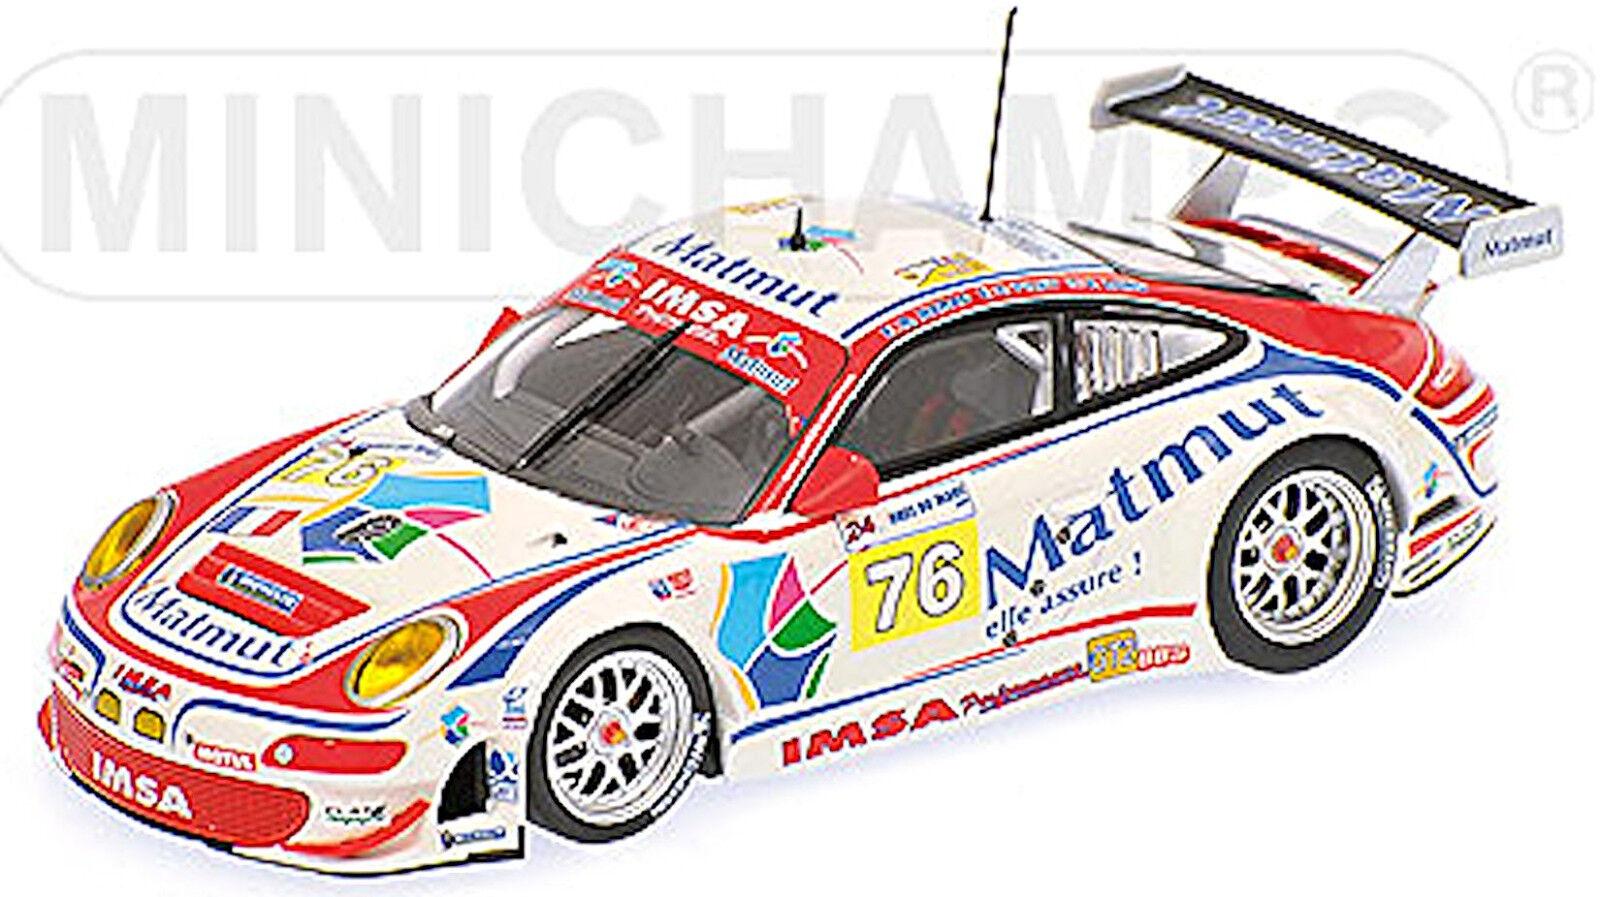 ventas calientes Porsche 911 997 997 997 24h Lemans 2009 NARAC Long Pilet  76 1 43 Minichamps  estar en gran demanda